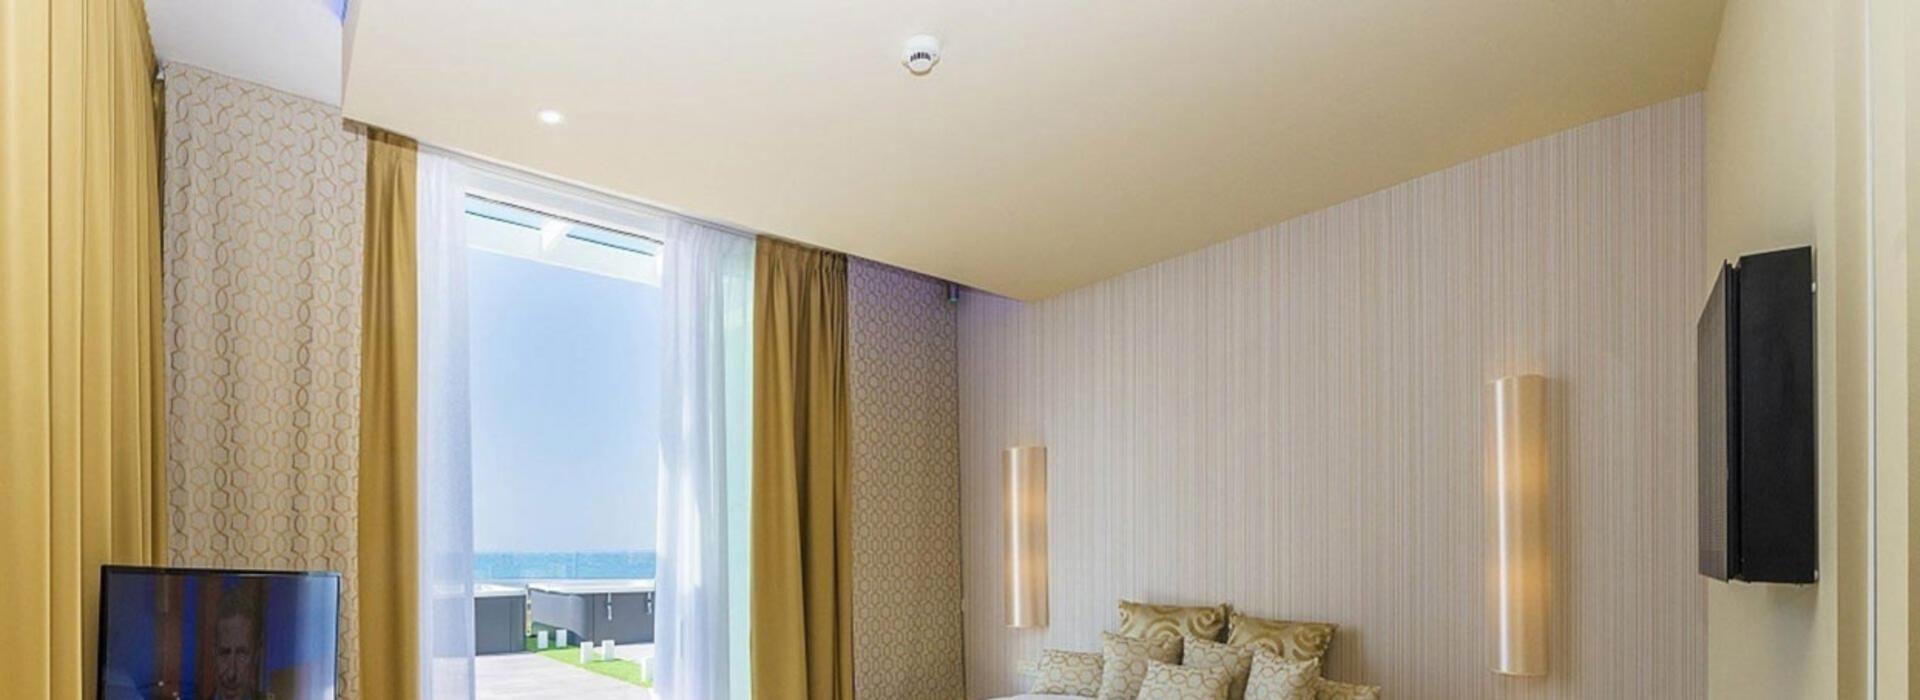 hotel-montecarlo ru gallery 019